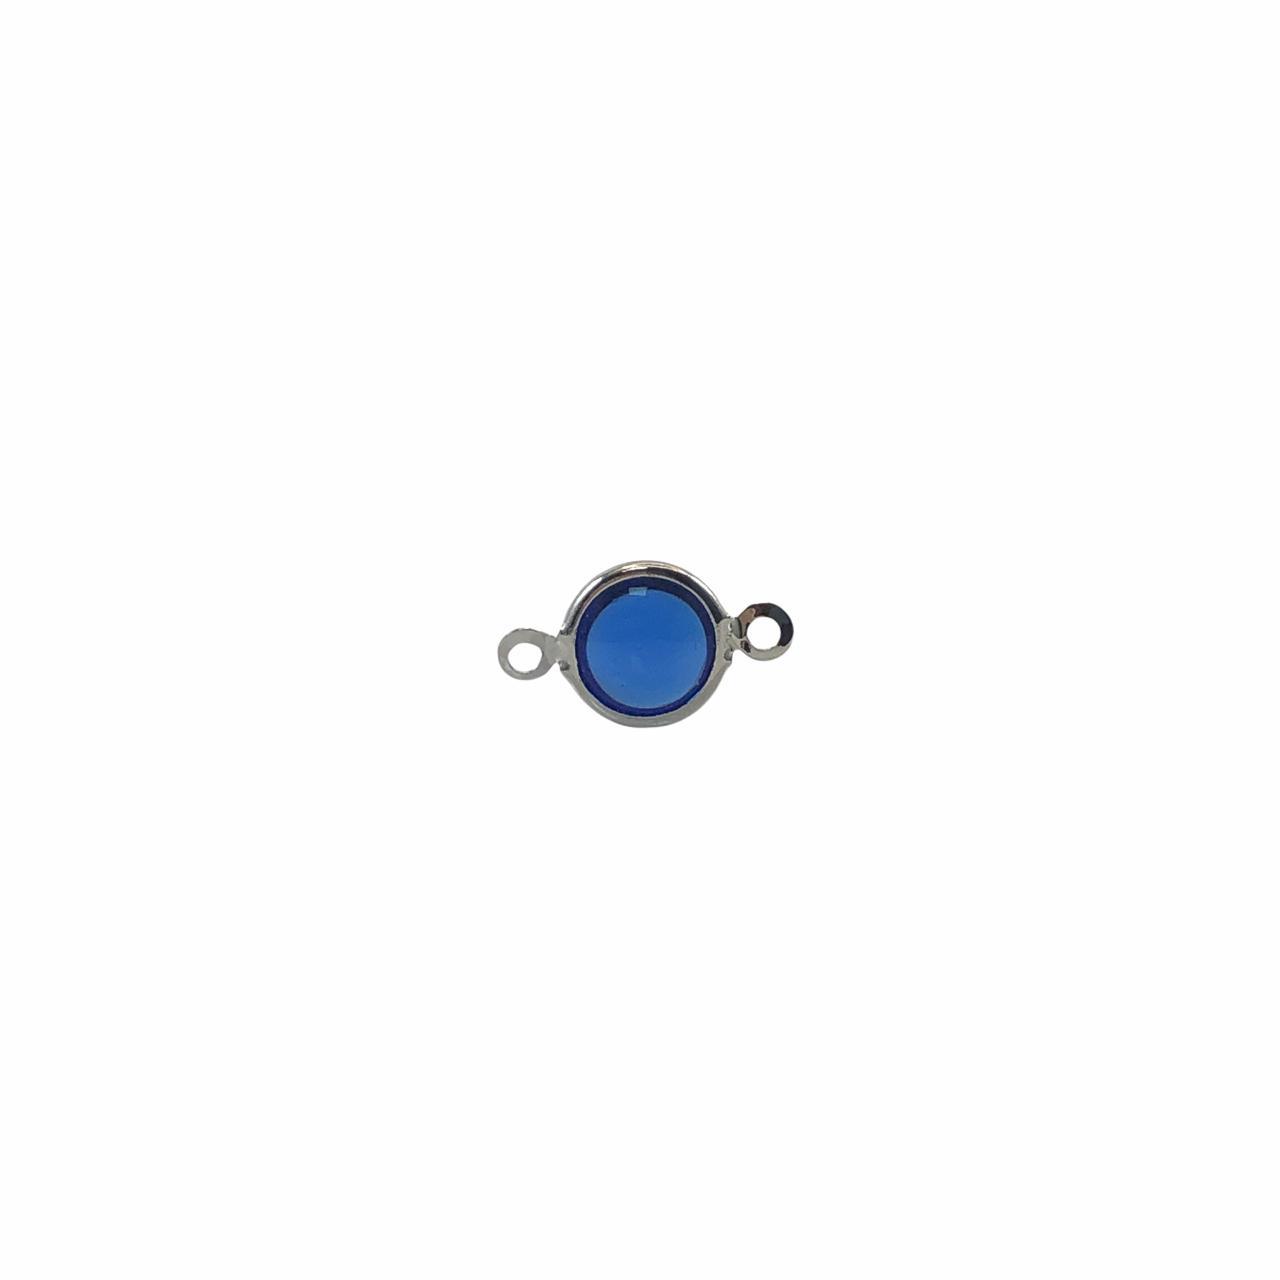 ETM581 - Entremeio De Vidro Sapphire 8mm Banhado Cor Prata - 4Unids